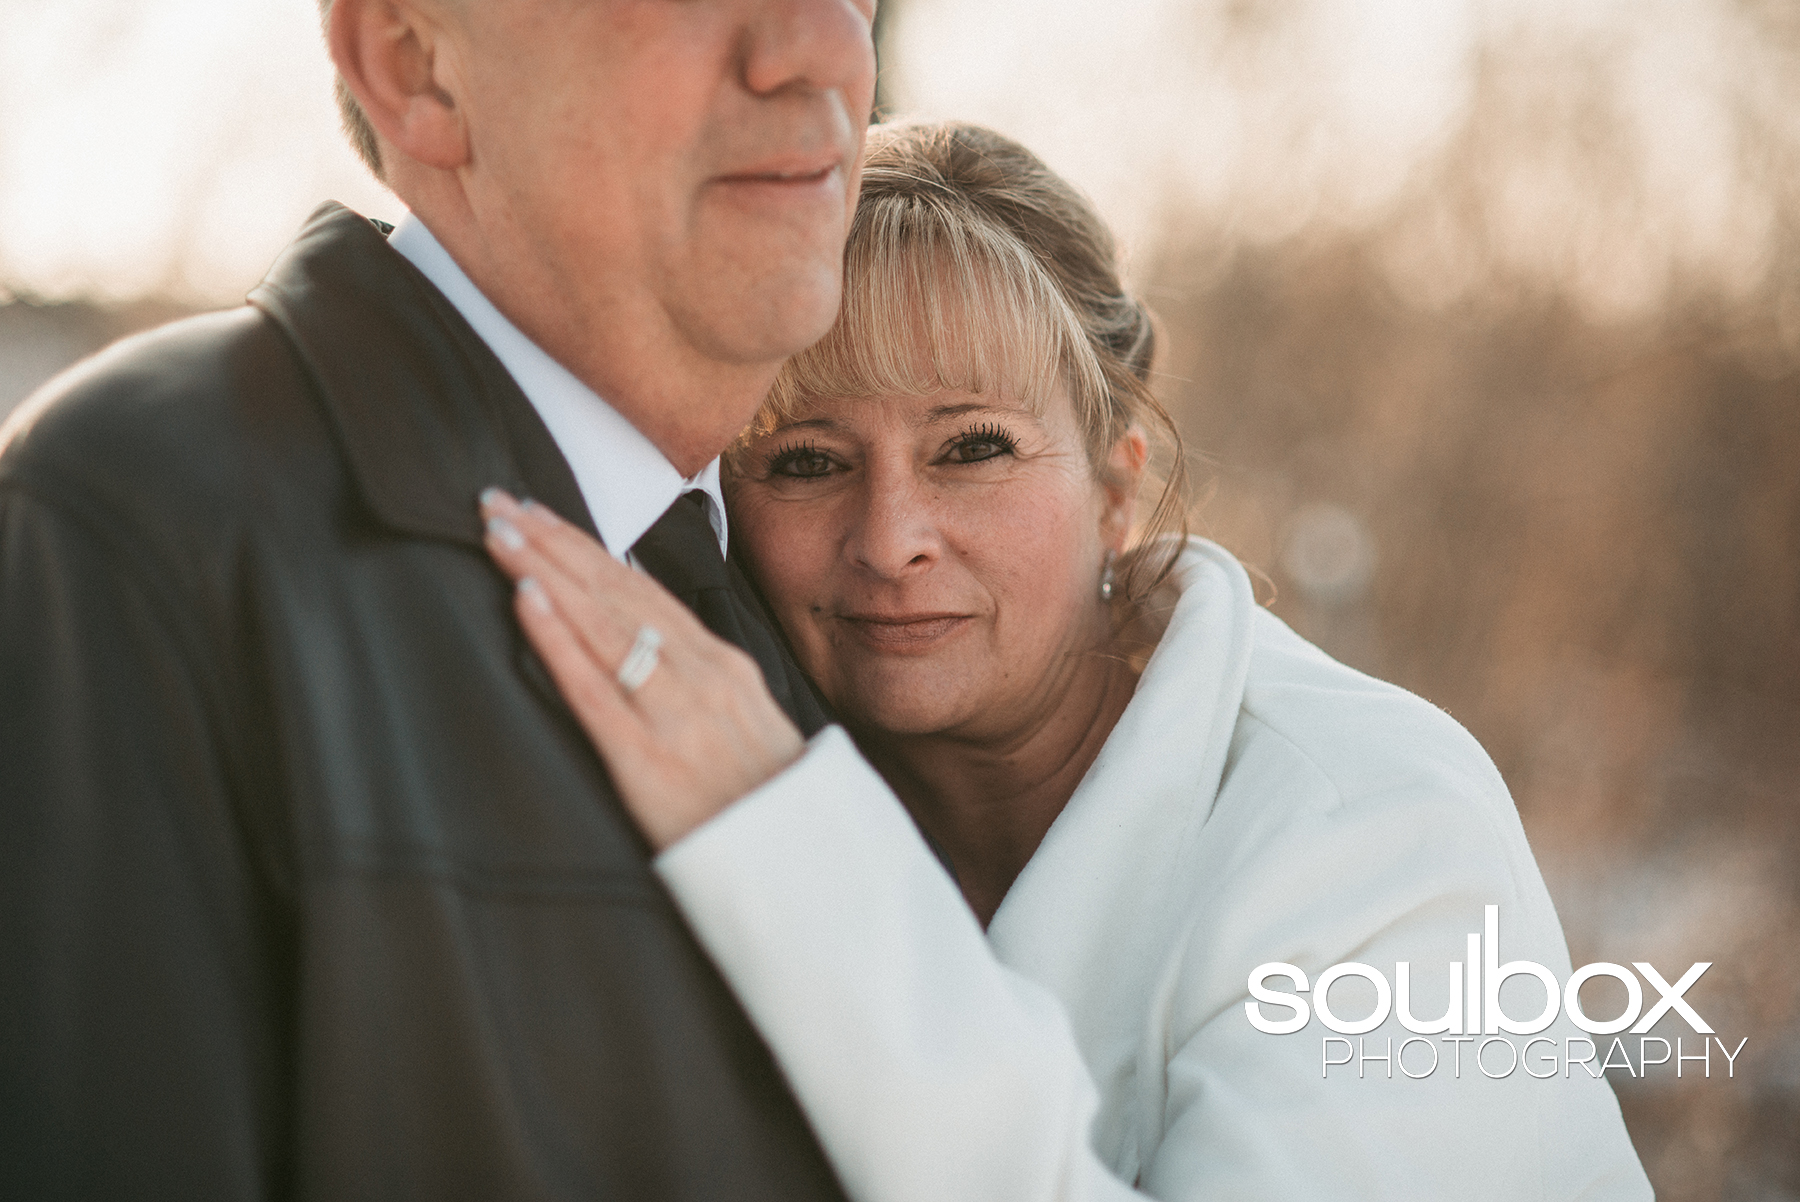 SoulboxPhotography-WinterWedding-3.jpg